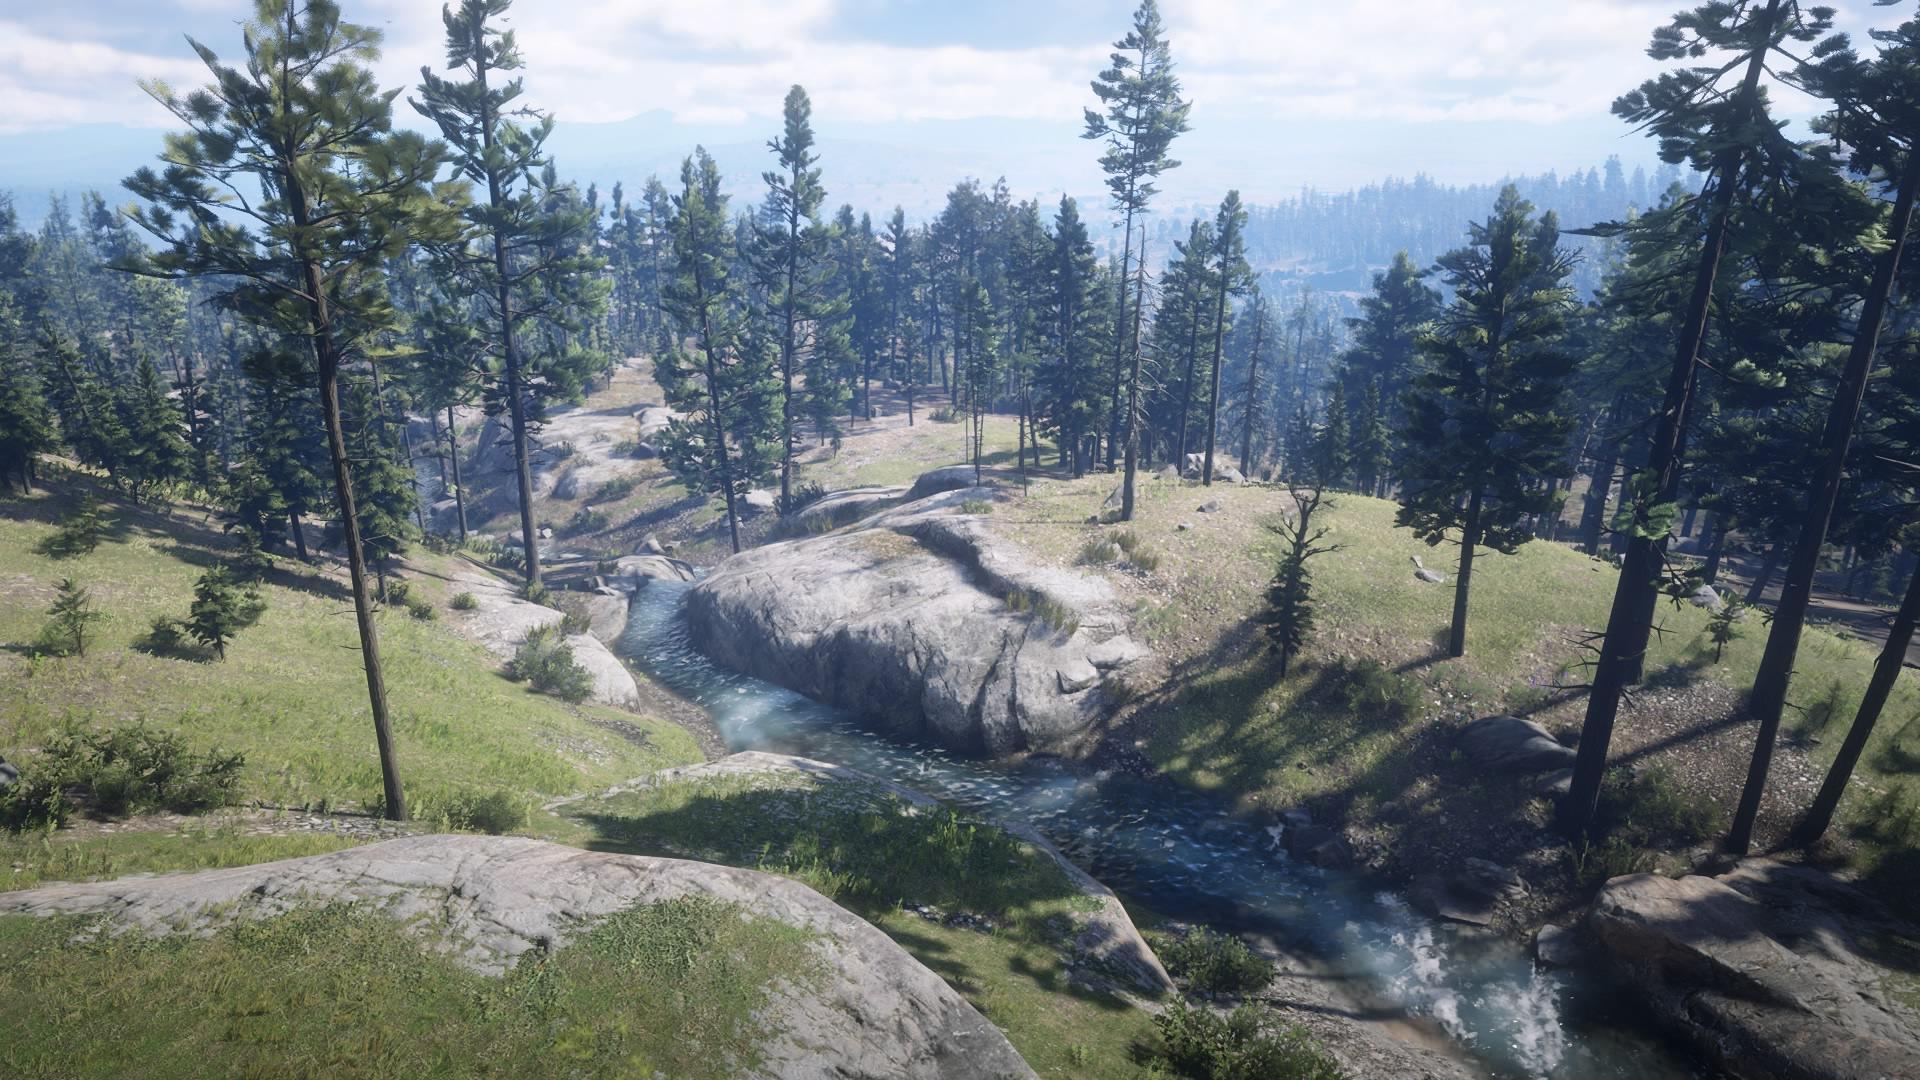 Hawks Eye Creek